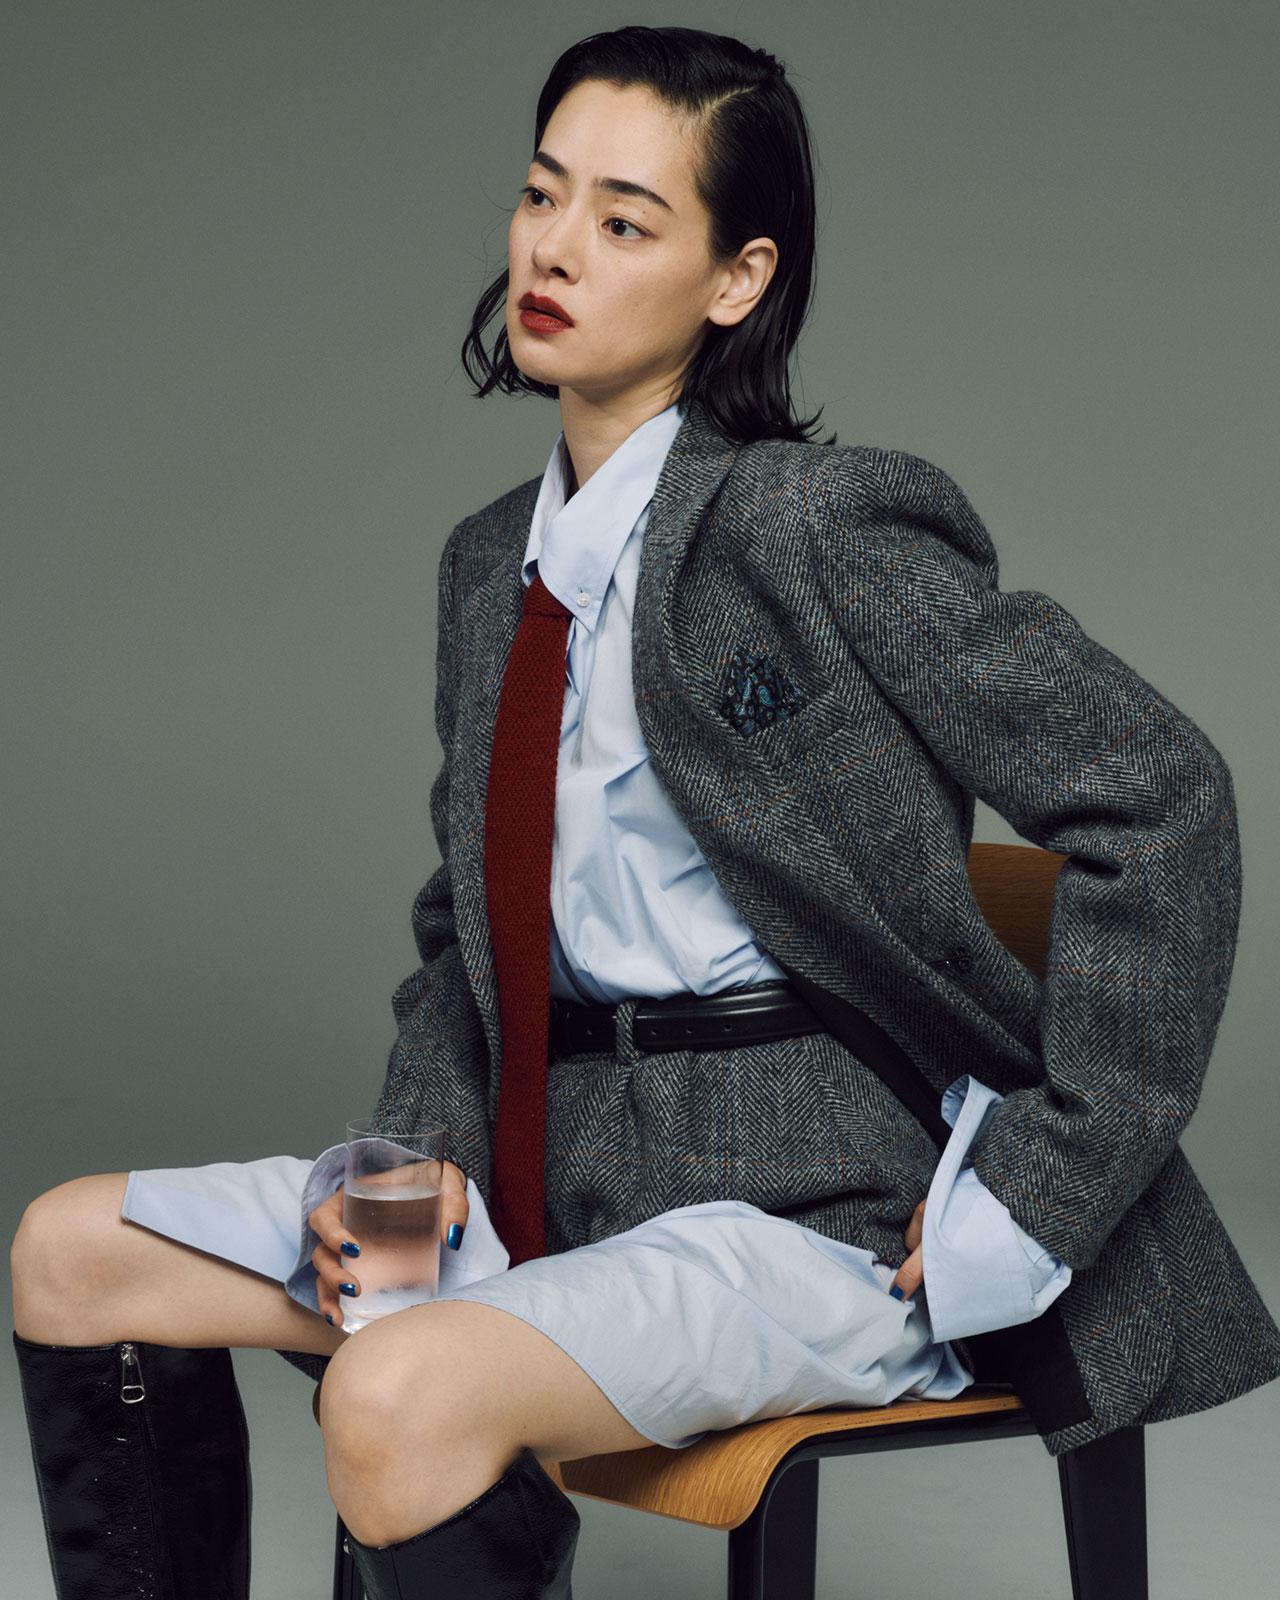 <Creative Staff> Photographer: Mitsuo Okamoto | Stylist: Megumi Yoshida | Hair&Makeup: Hiroko Ishikawa <The Look includes>ジャケット ¥320,000、シャツ ¥95,000、ショーツ ¥65,000、ブーツ ¥160,000、全て Maison Margiela(メゾン マルジェラ) | ヴィンテージのネクタイ ¥16,000、SURR by LAILA (シュール・バイ・ライラ) | ポケットチーフ、スタイリスト私物 | チェア¥ 77,000、Jean Prouve (ジャン・プルーヴェ)